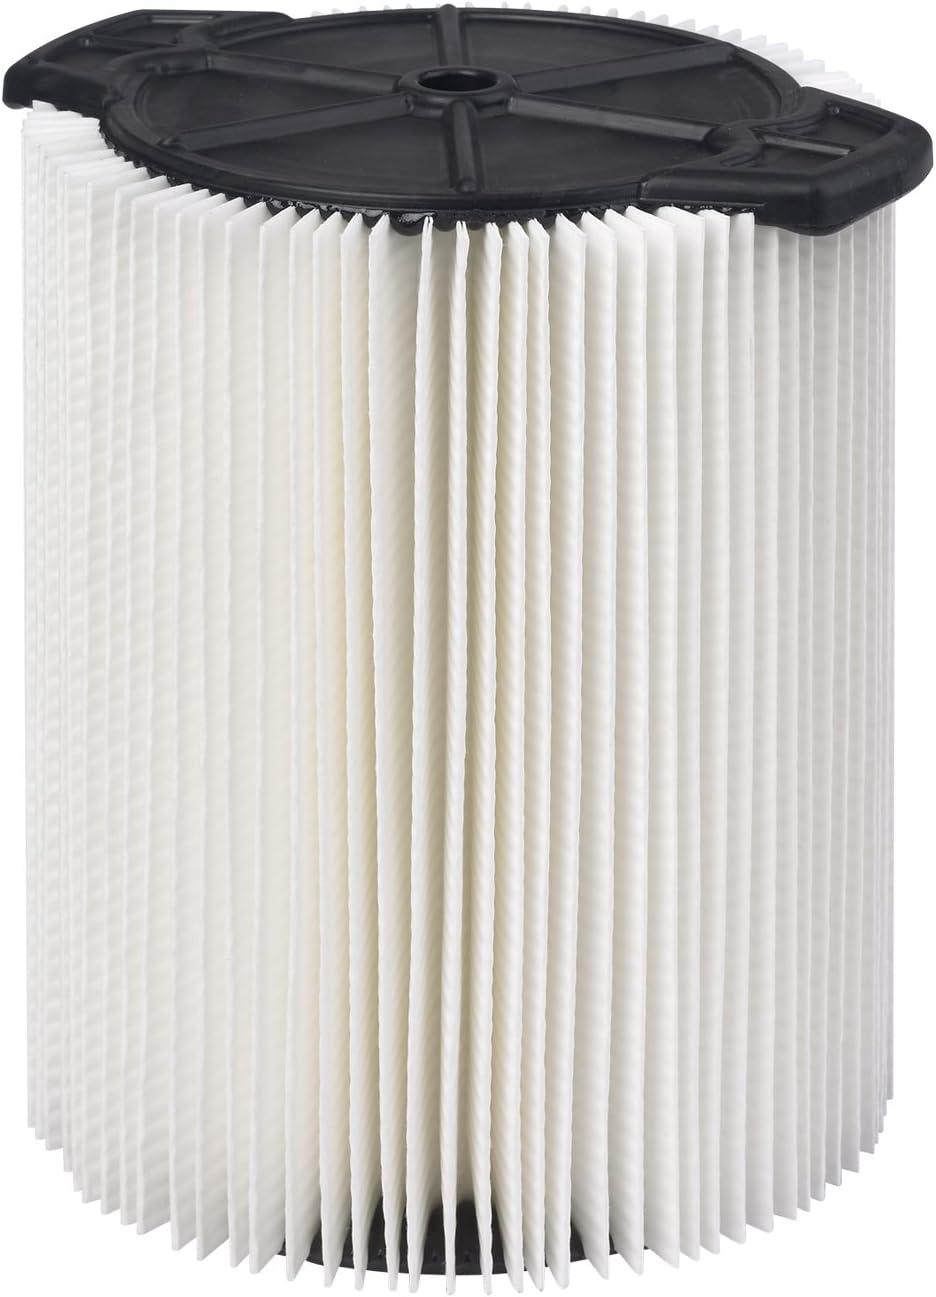 WORKSHOP Wet/Dry Vacs Vacuum Filter WS21200F Standard Wet/Dry Vacuum Filter (Single Shop Vacuum Cleaner Filter Cartridge) Fits WORKSHOP 5-Gallon To 16-Gallon Shop Vacuum Cleaners